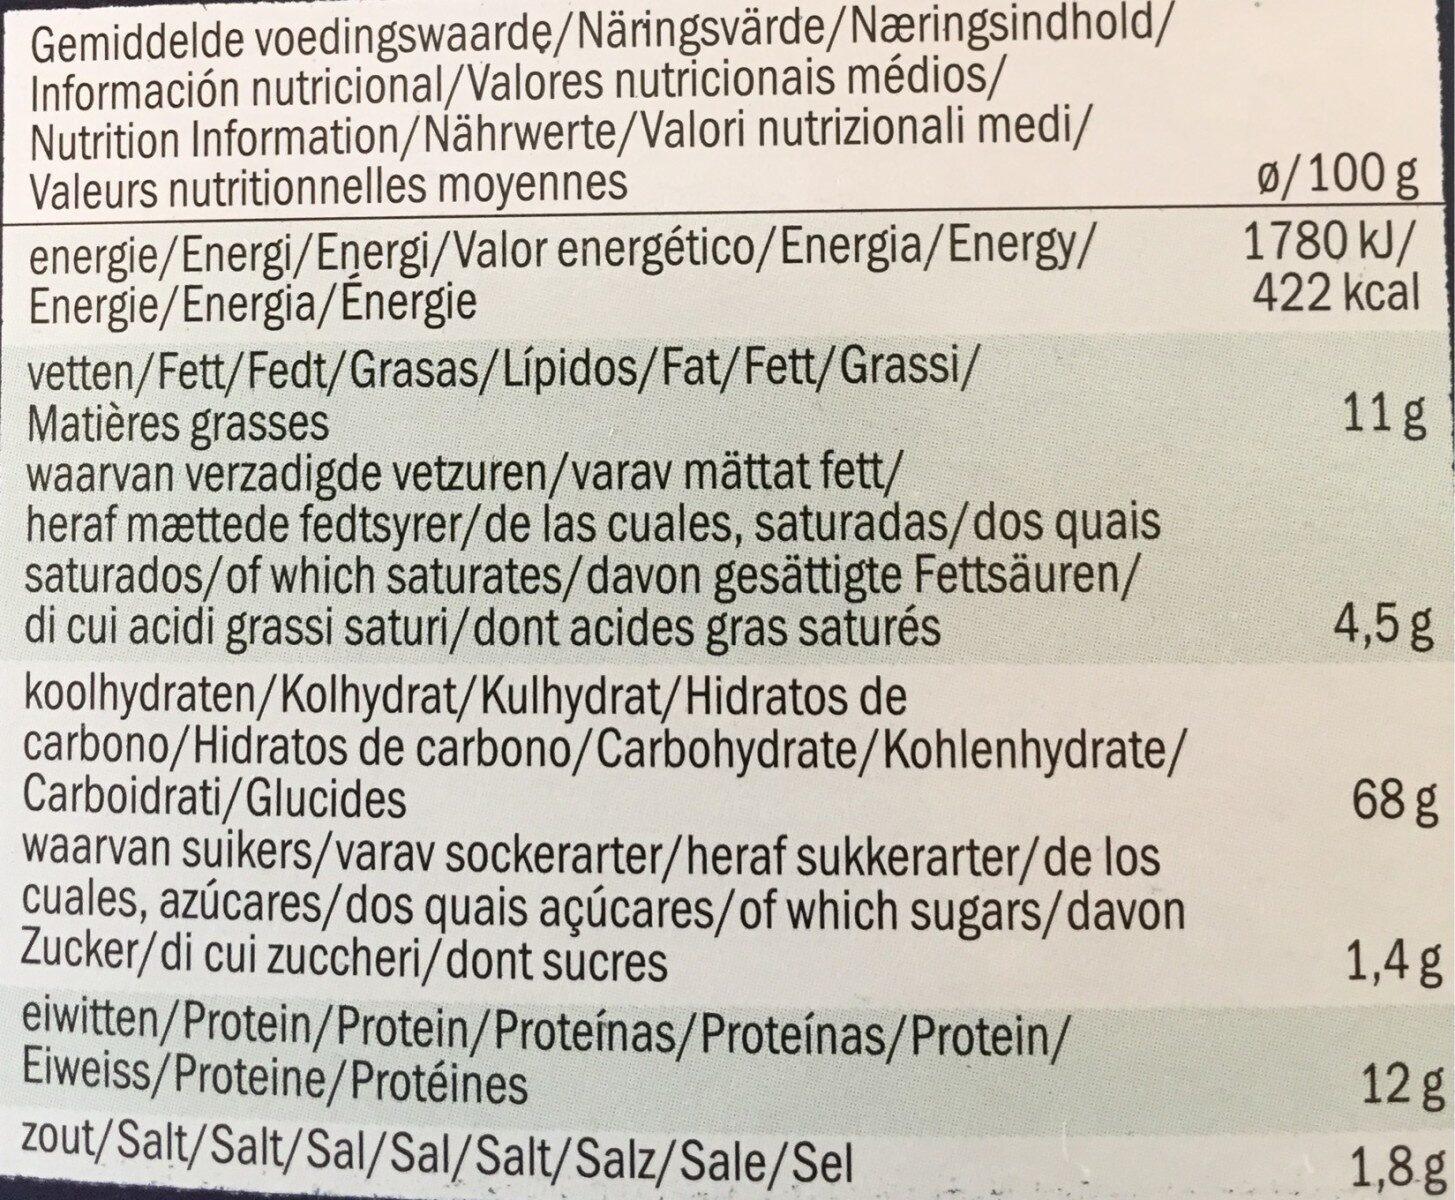 Grissini Rosmarino - Informations nutritionnelles - fr